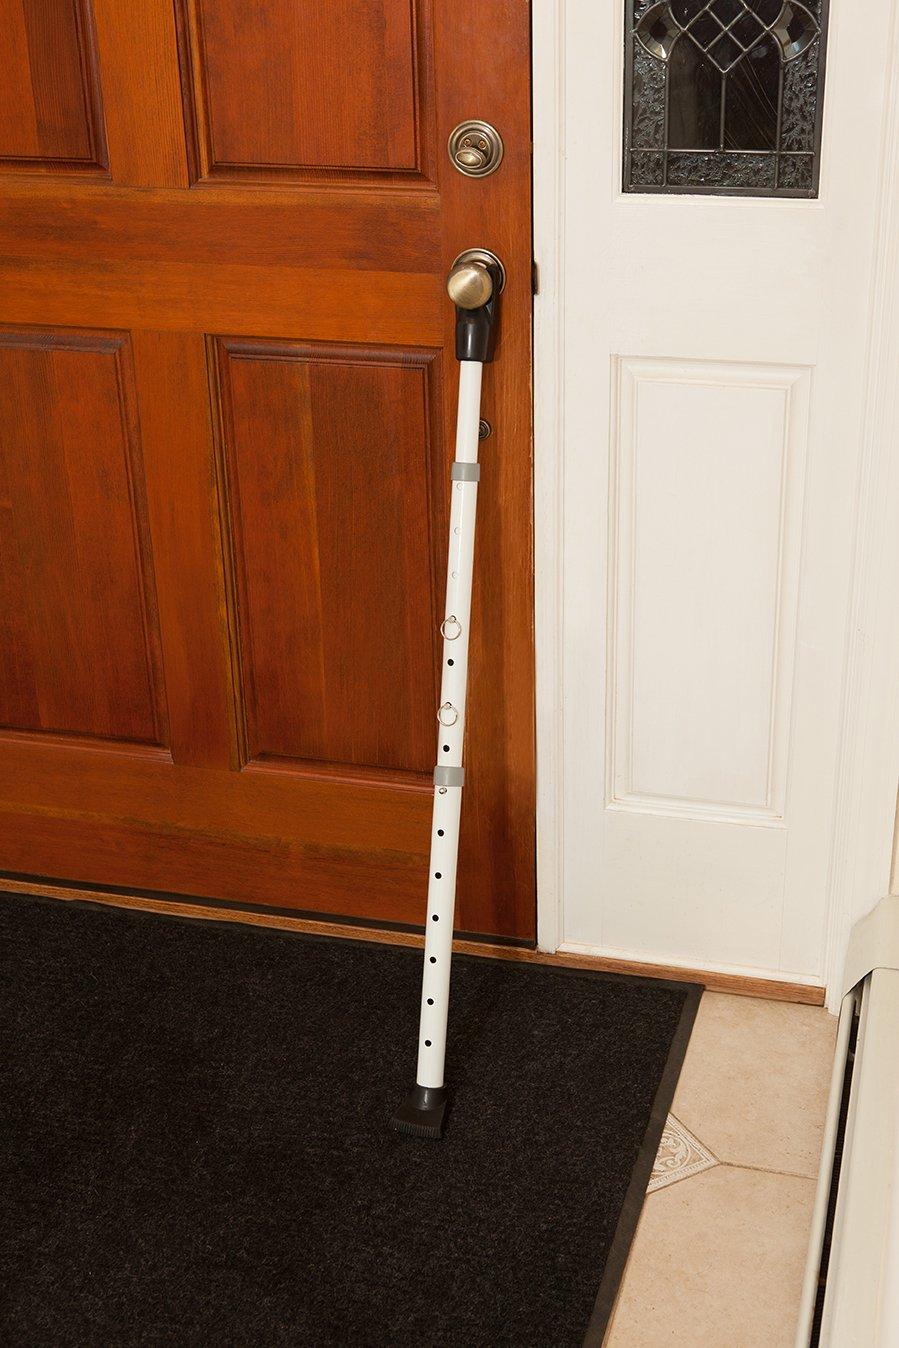 Mace Brand 80116 Jammer Home Security Door Brace by Mace (Image #3)